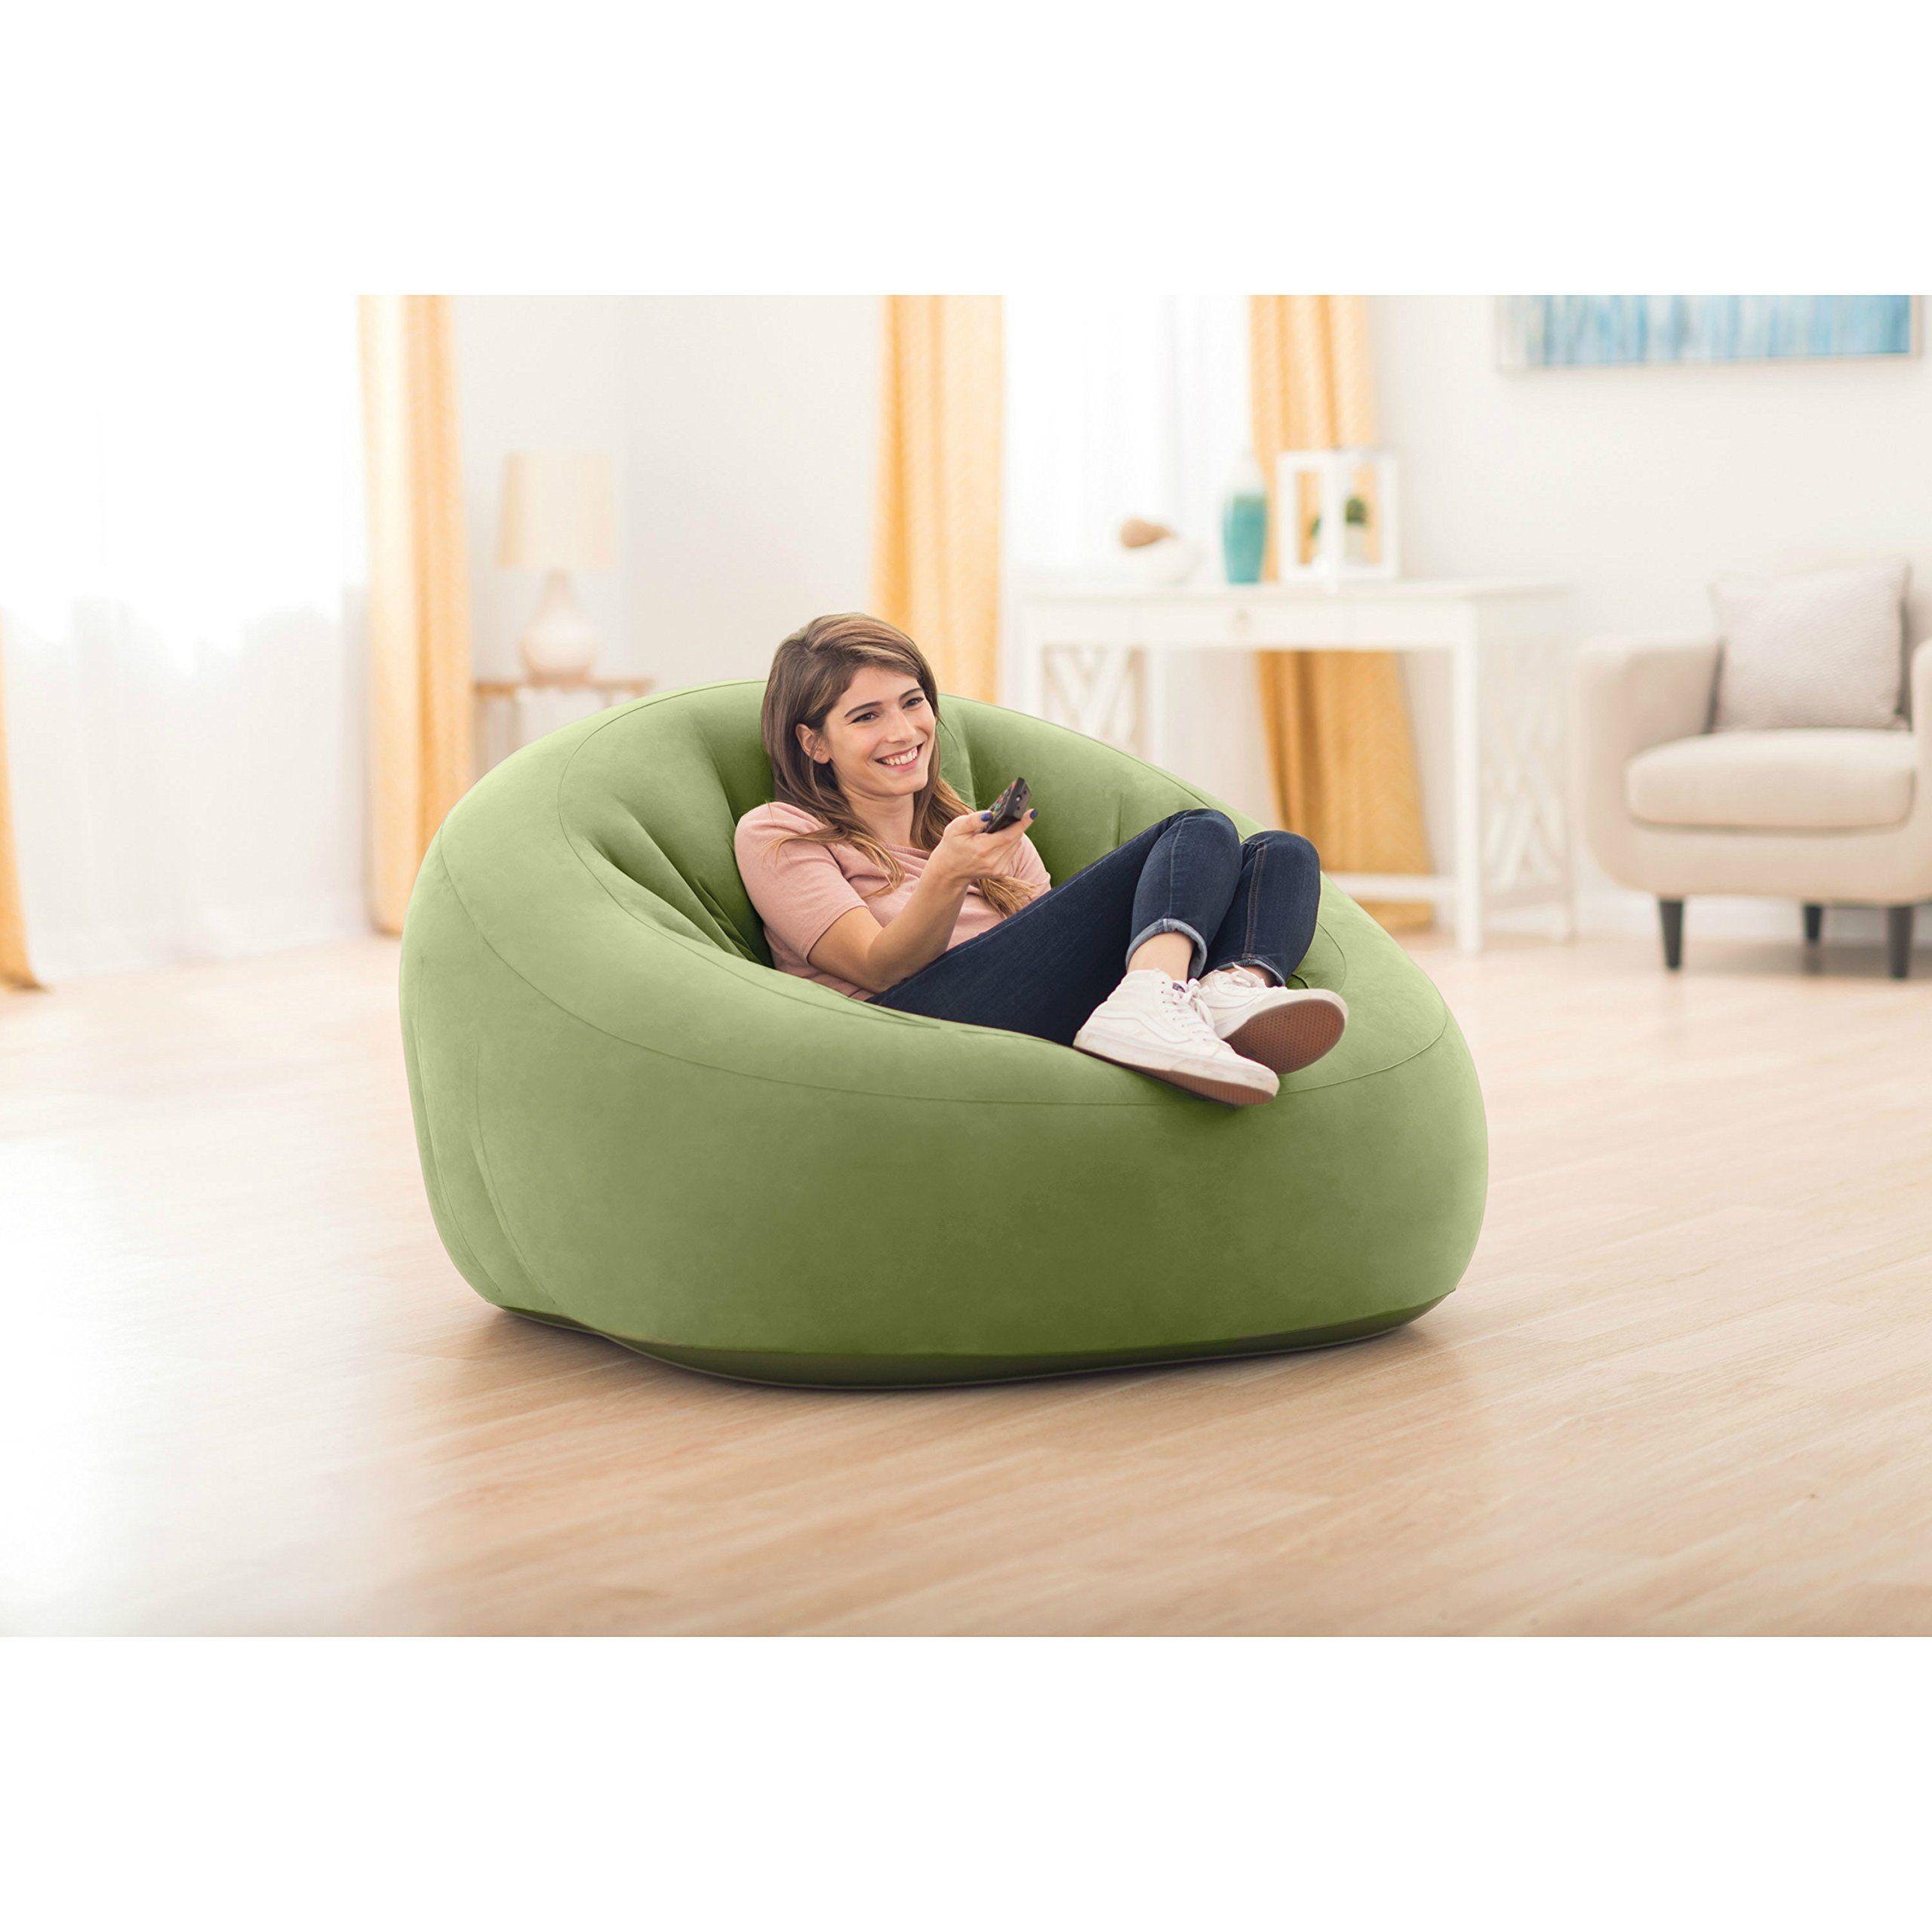 Incredible Intex Beanless Bag Club Chair Inflatable Chair 49 X 47 X 30 Dailytribune Chair Design For Home Dailytribuneorg